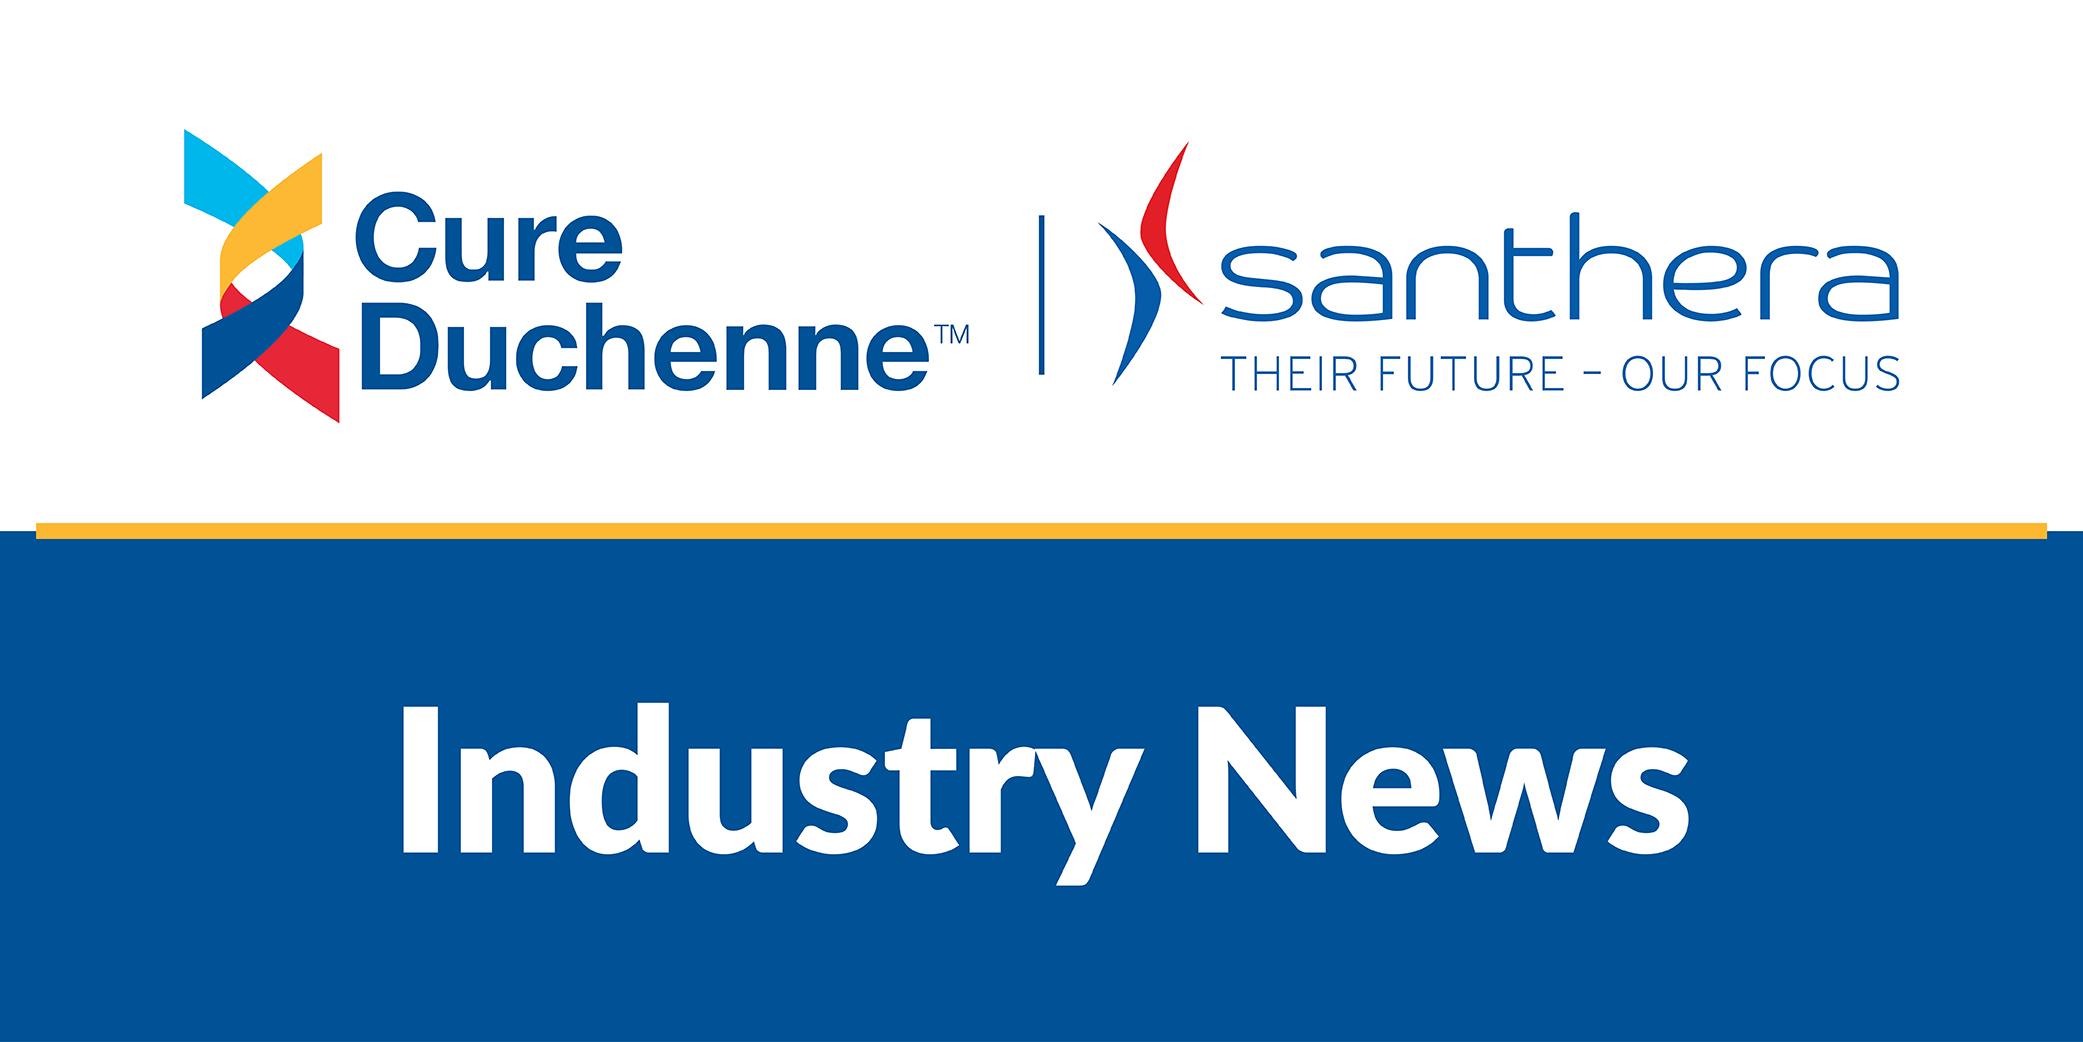 Santhera News Banner